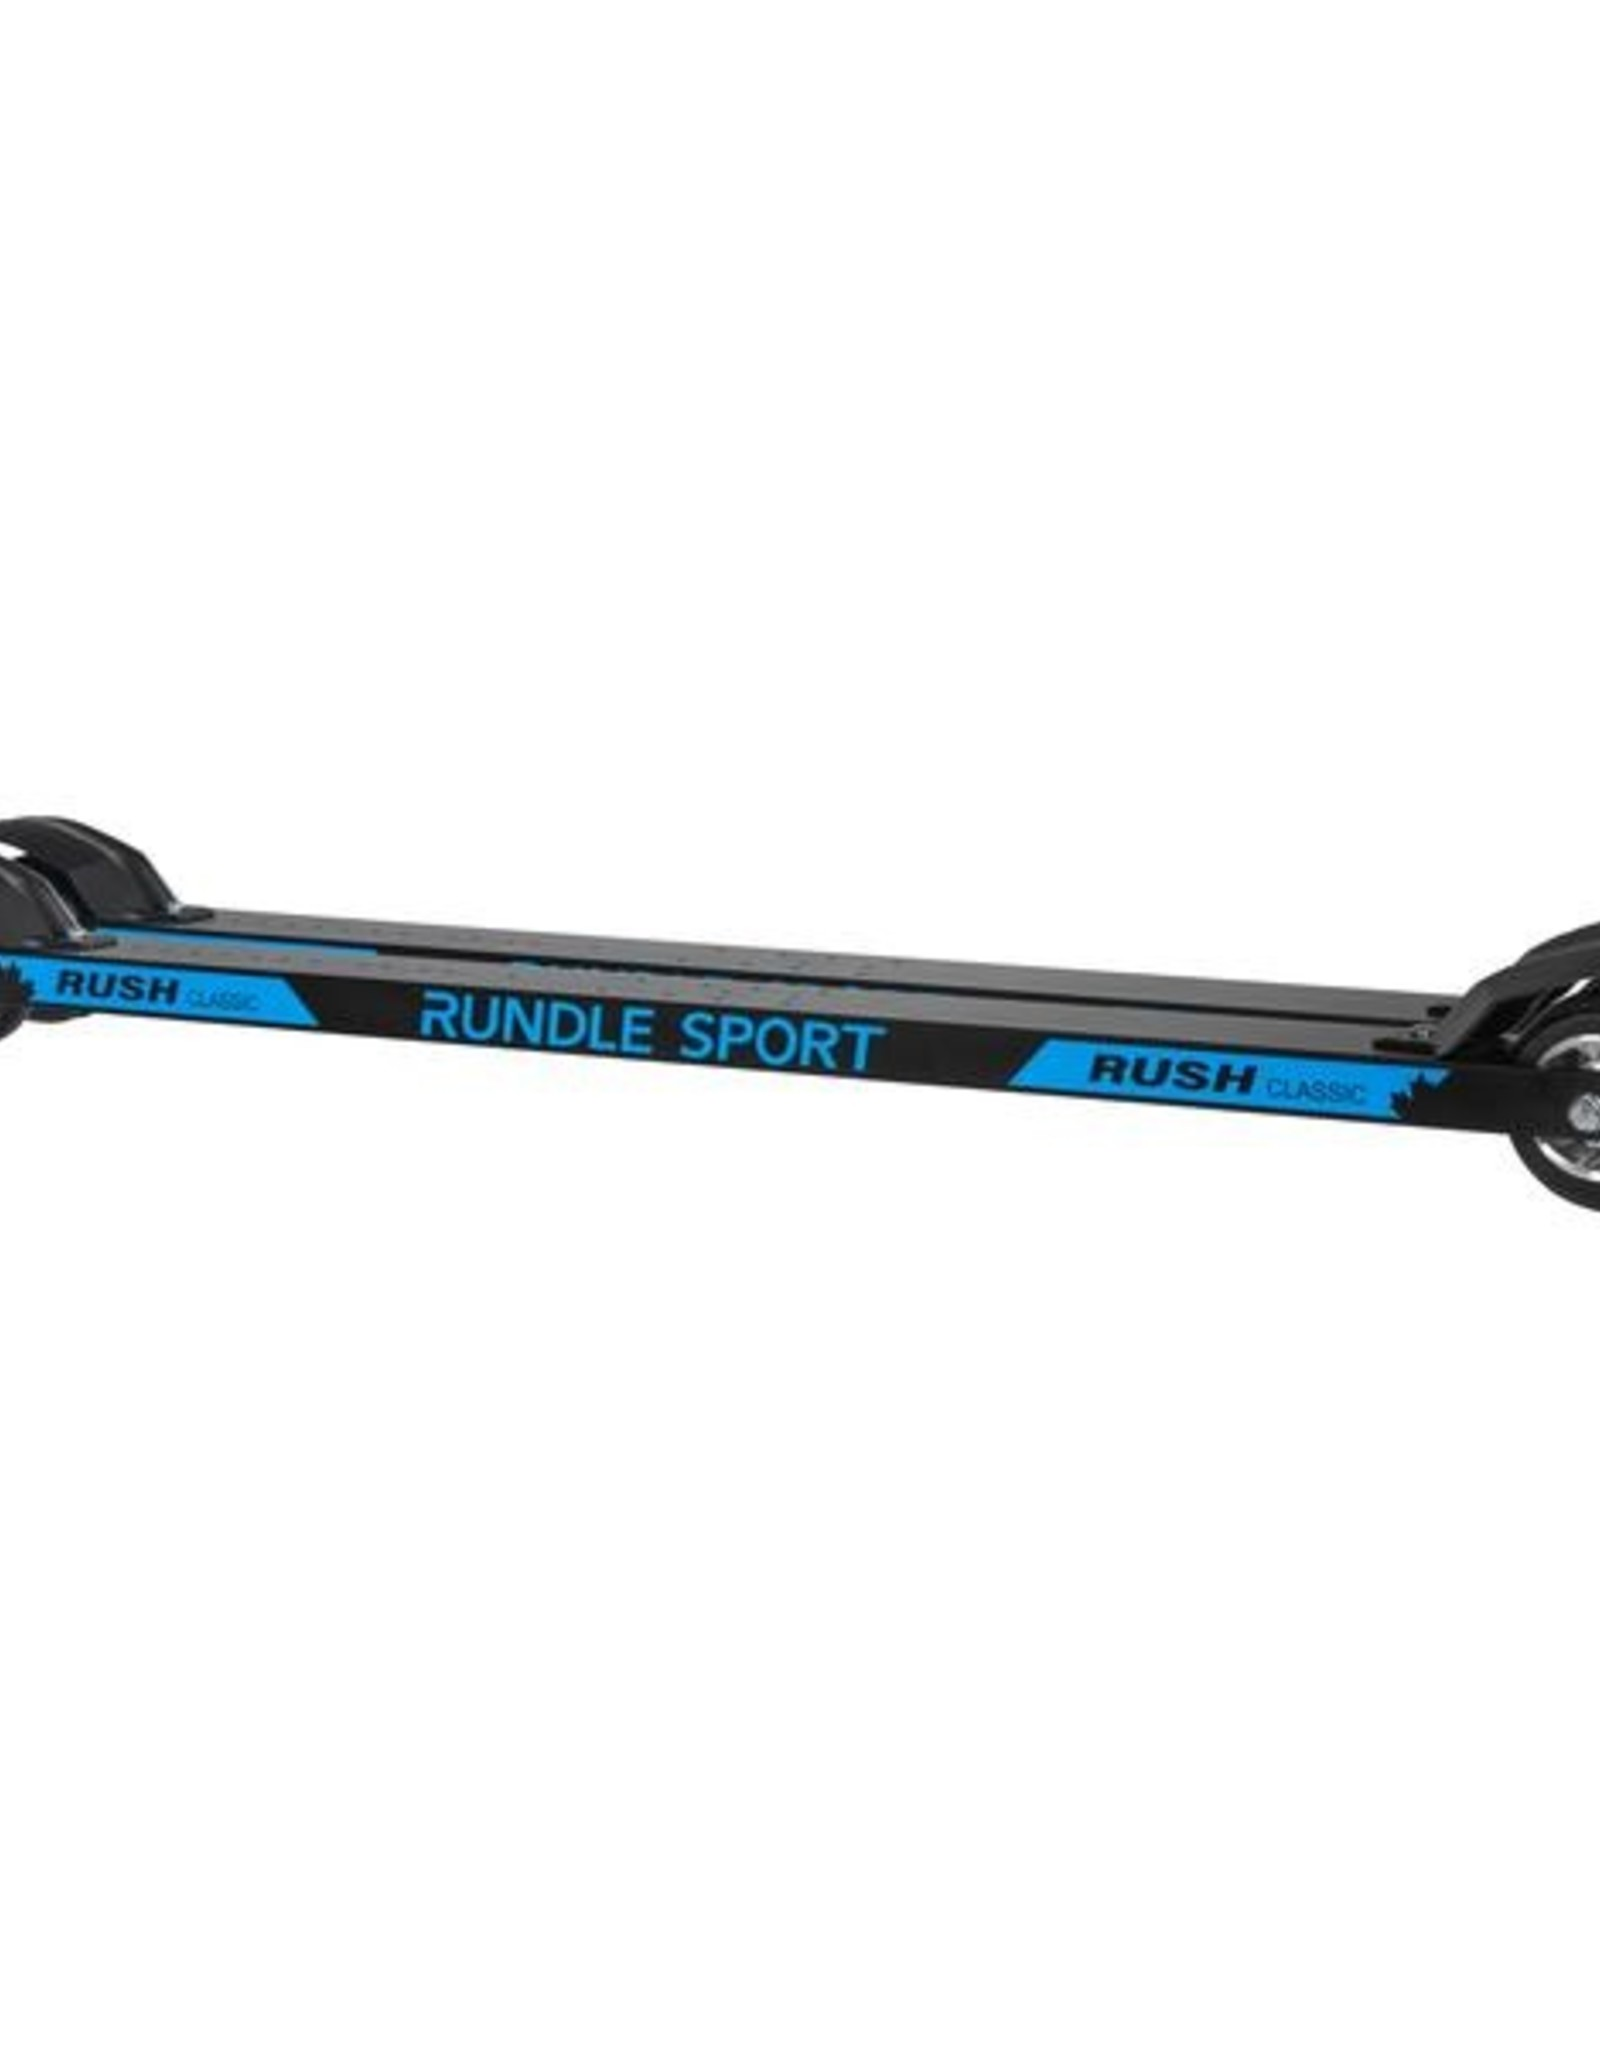 Rundle Sport inc. Rush Classic